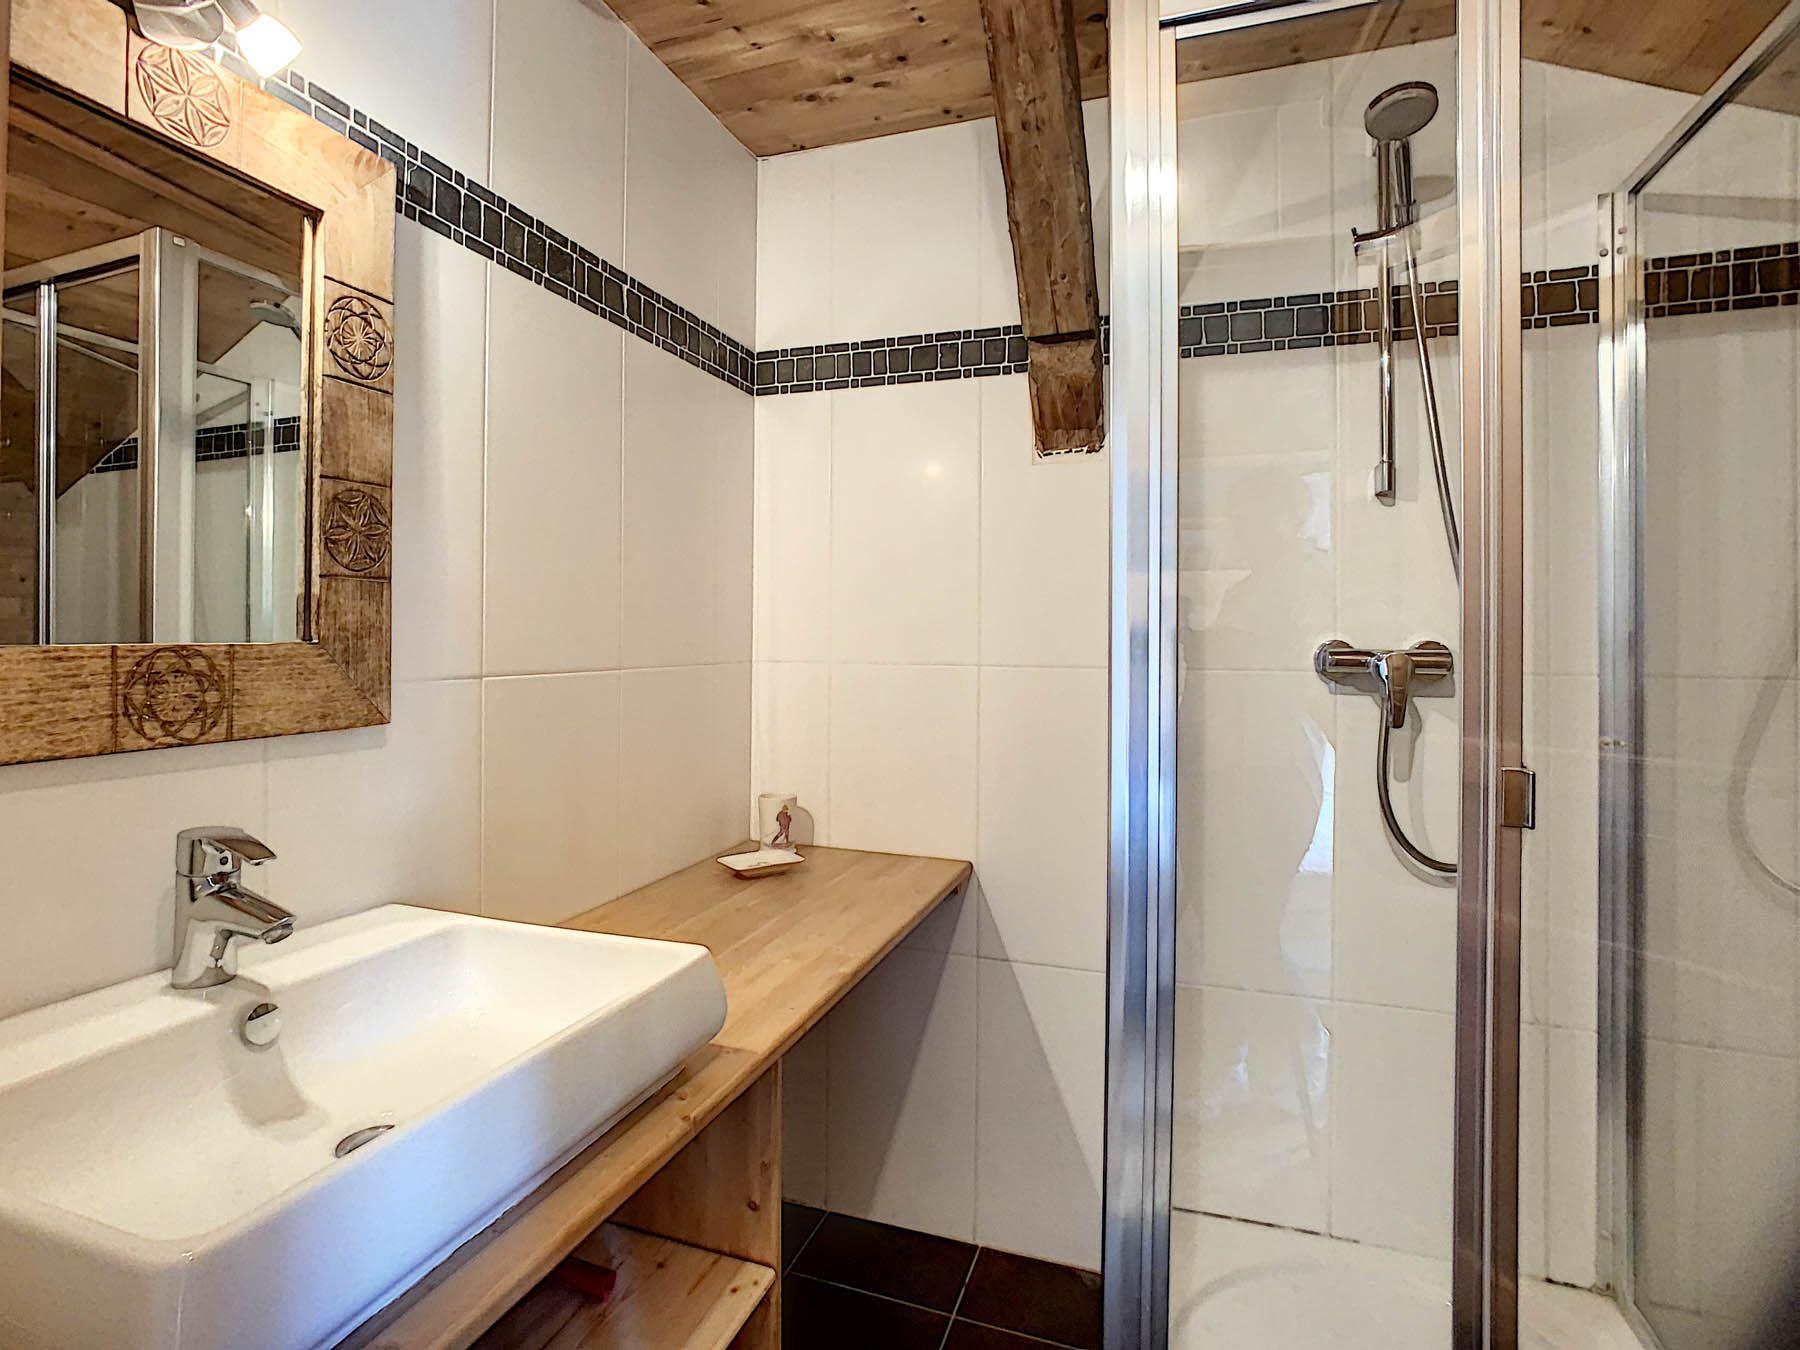 Mernaz 1160 En-suite Shower Room